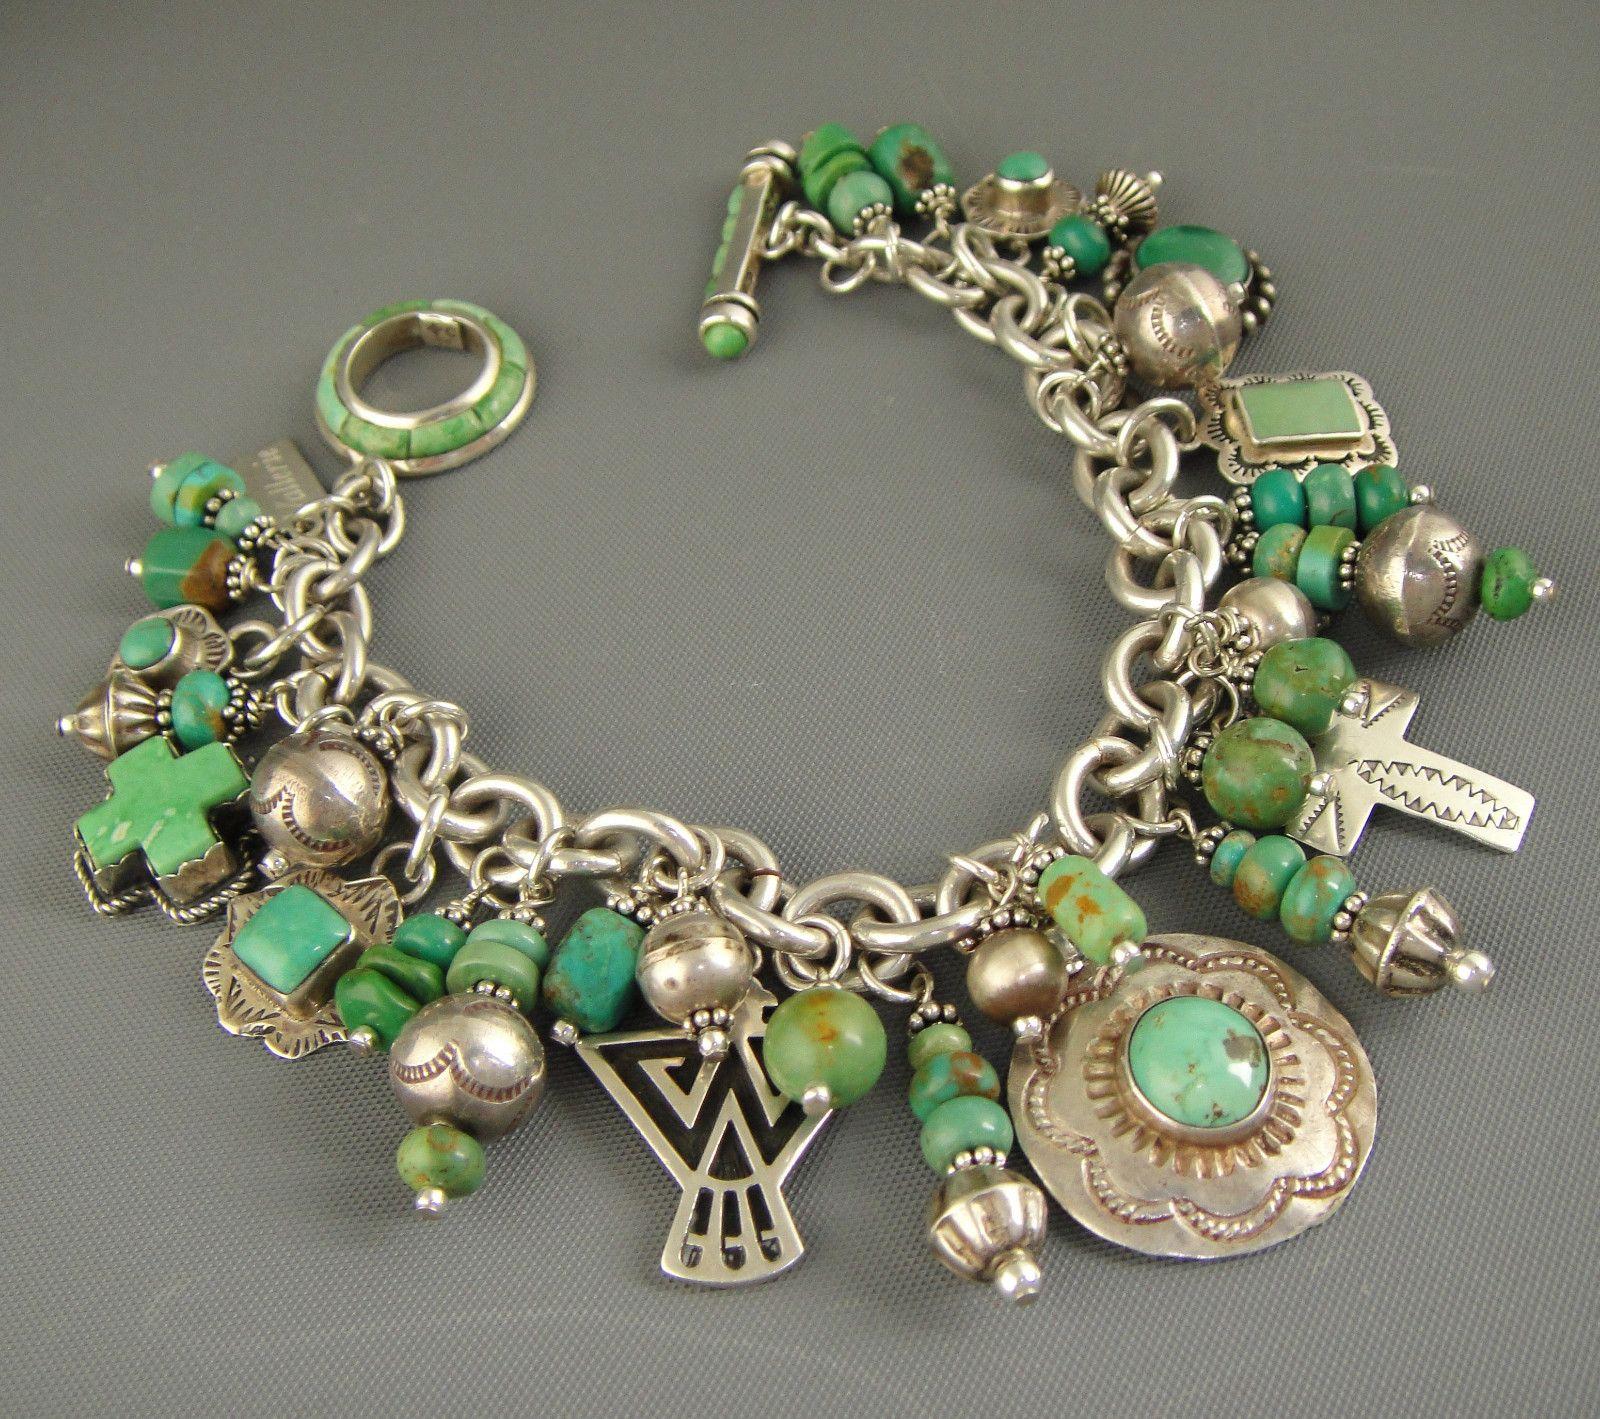 Vintage navajo green turquoise joan slifka cross pendant charm vintage navajo green turquoise joan slifka cross pendant charm bracelet necklace aloadofball Image collections